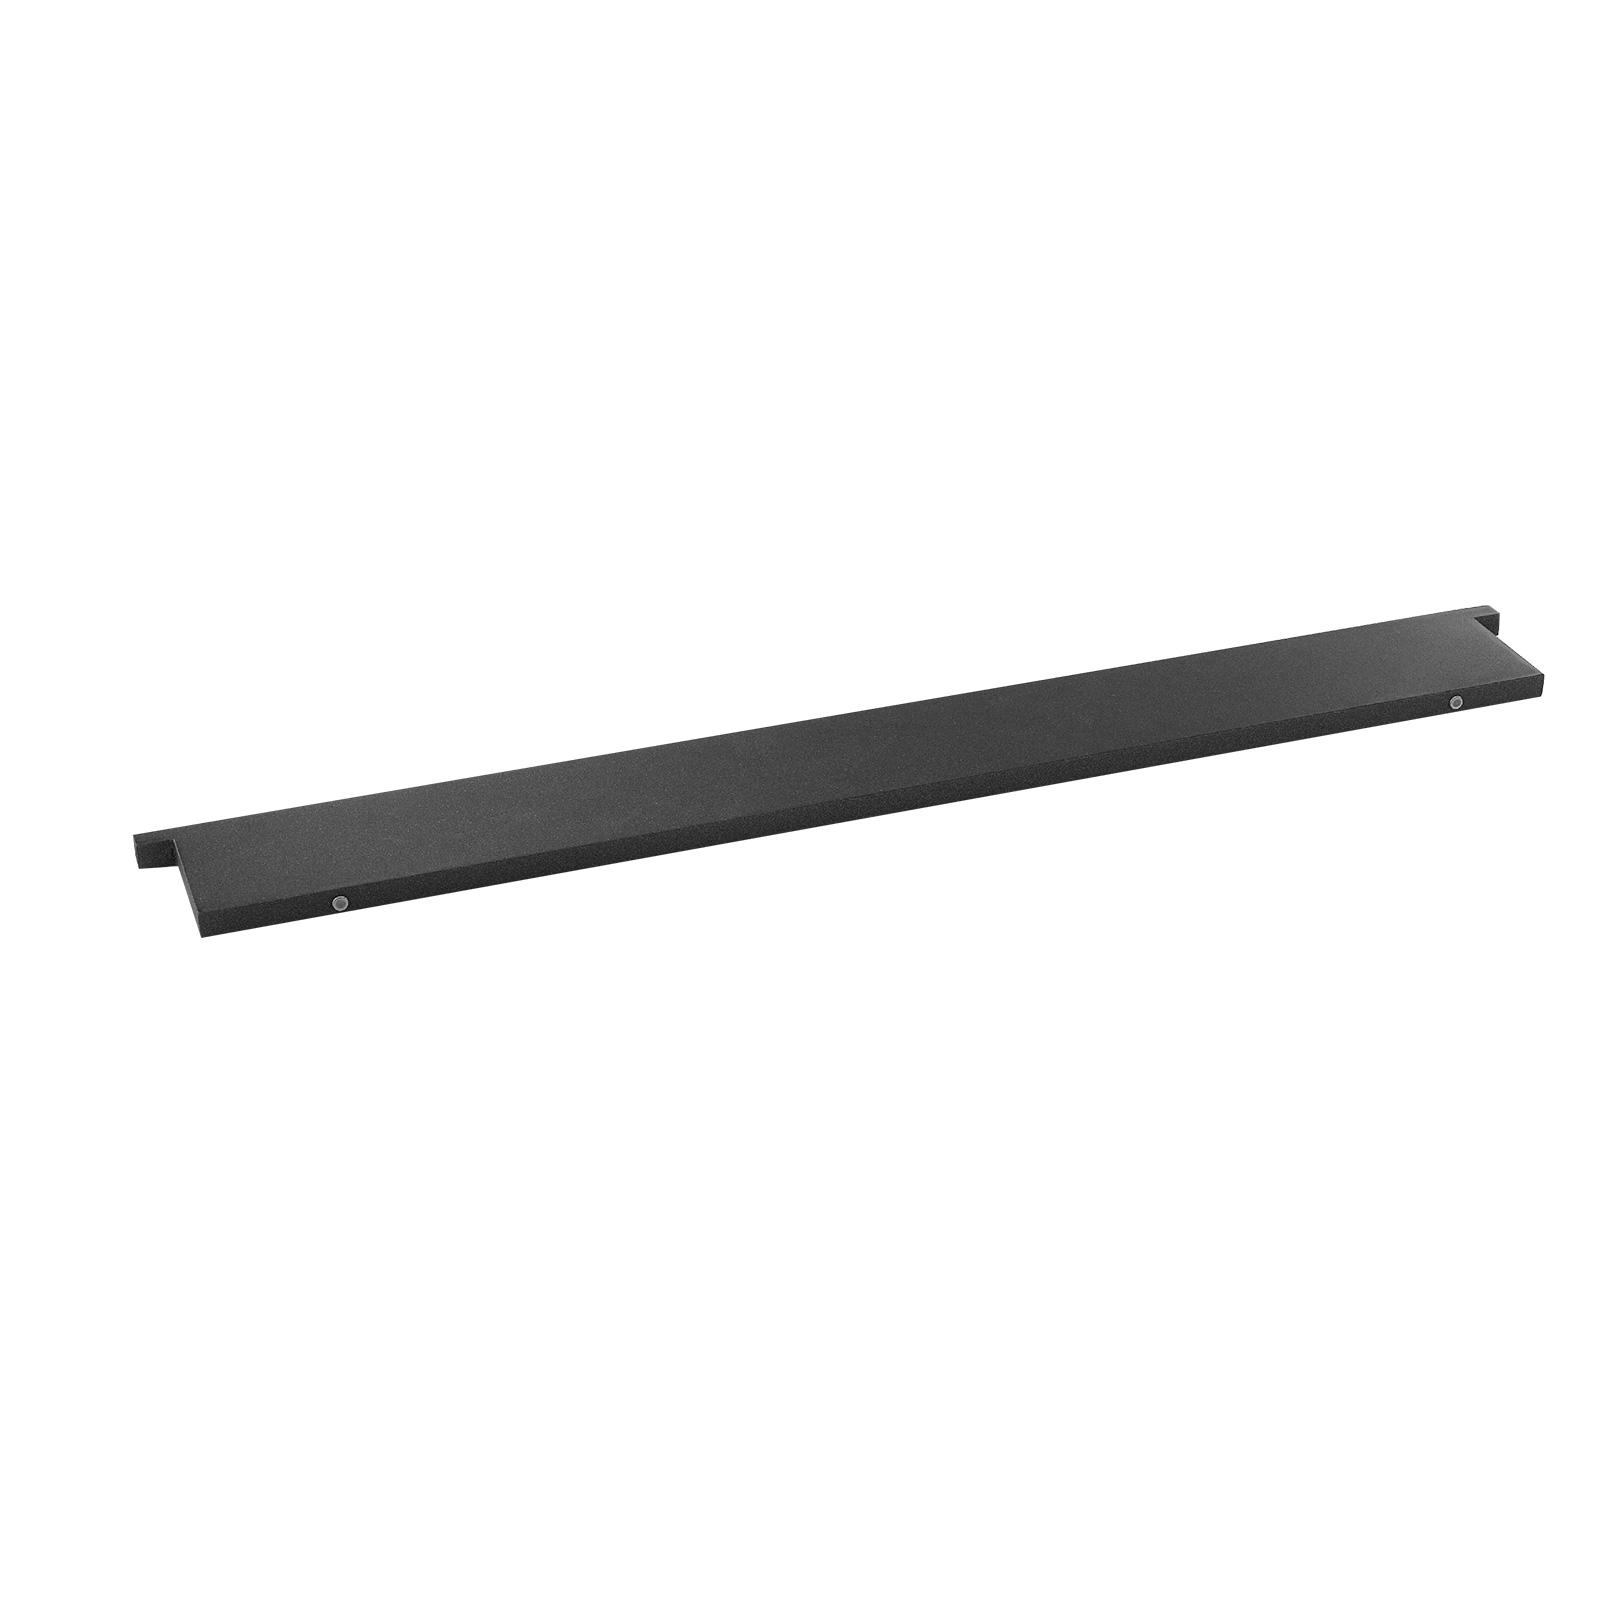 Vollrath V904990 display riser shelf